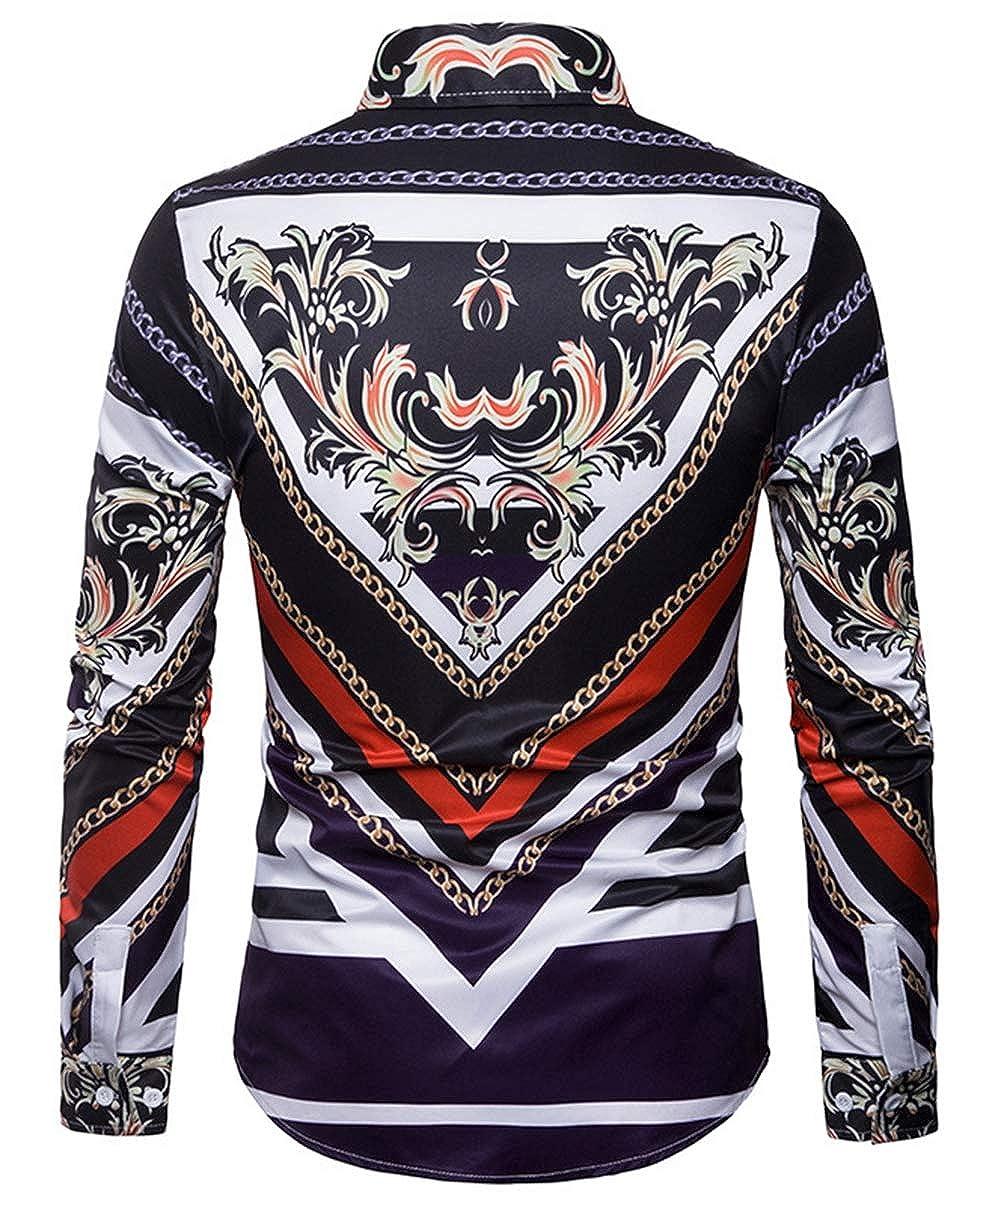 Mens Large Size Shirt Fashion Casual Classic Color Matching Print Pattern Long Sleeve Simple Wild Shirt Shirt